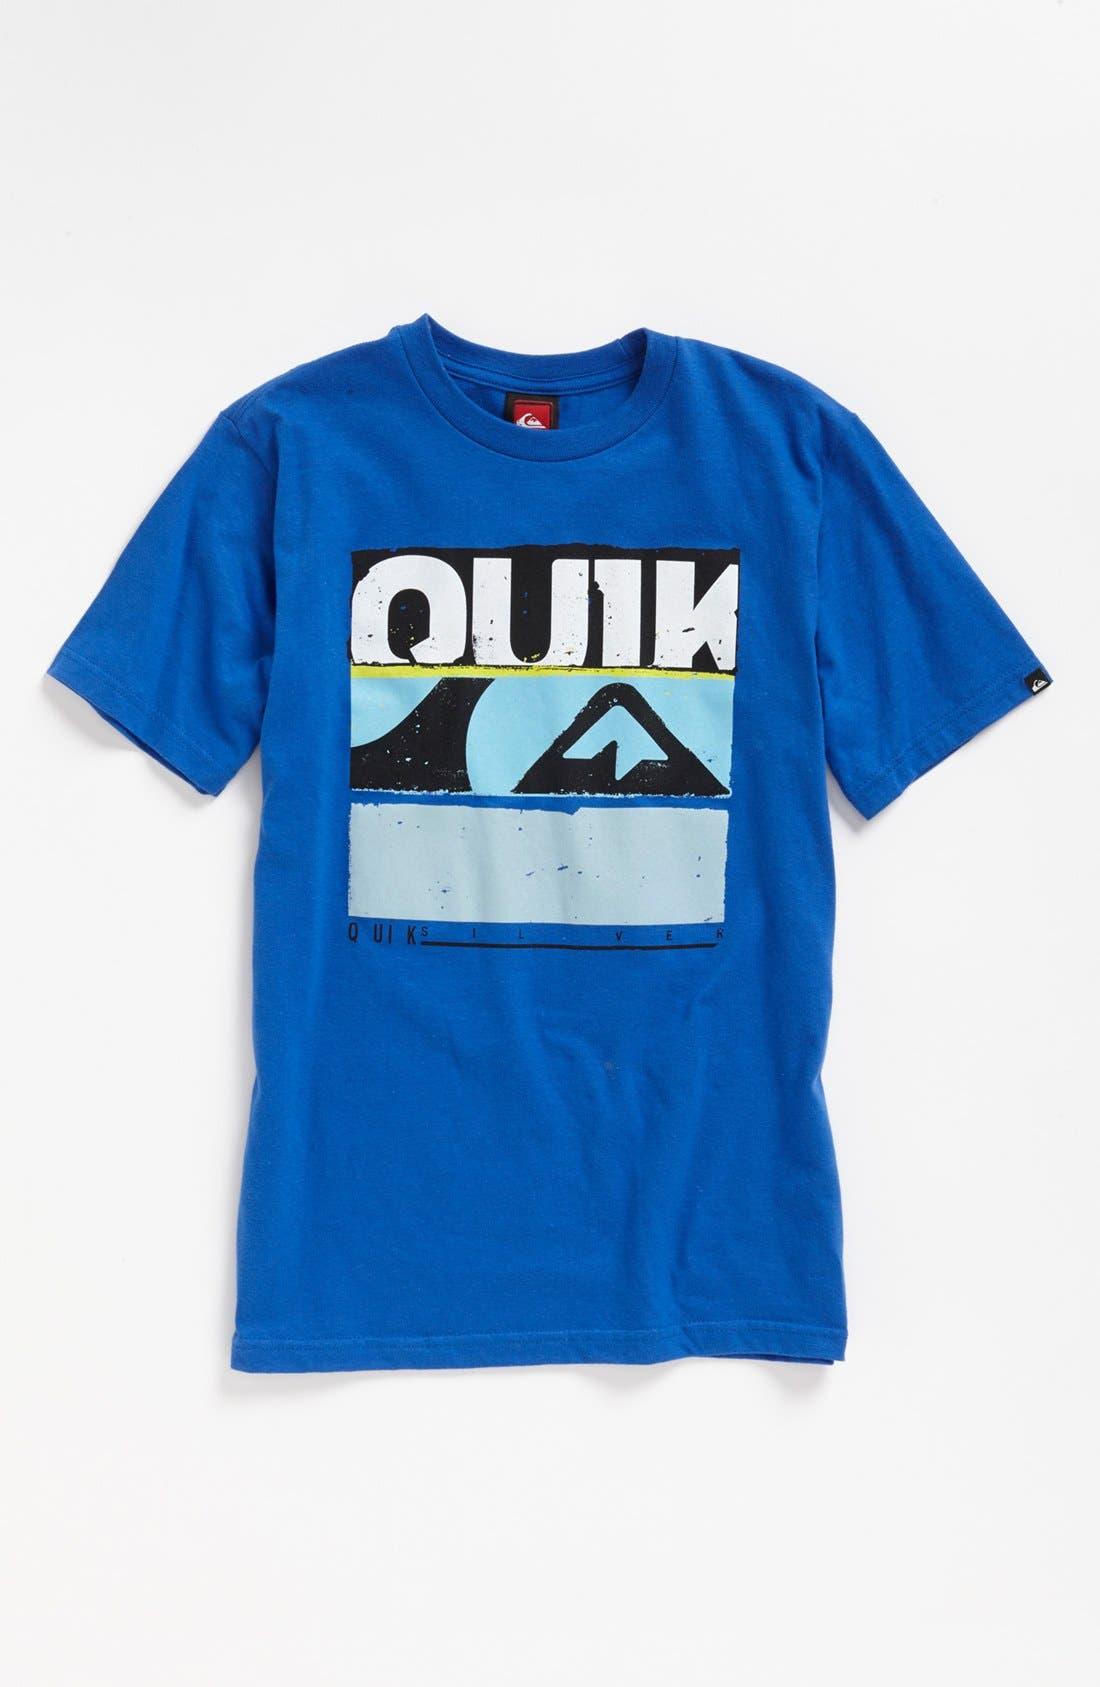 Alternate Image 1 Selected - Quiksilver 'Unglued' T-Shirt (Little Boys & Big Boys) (Online Only)